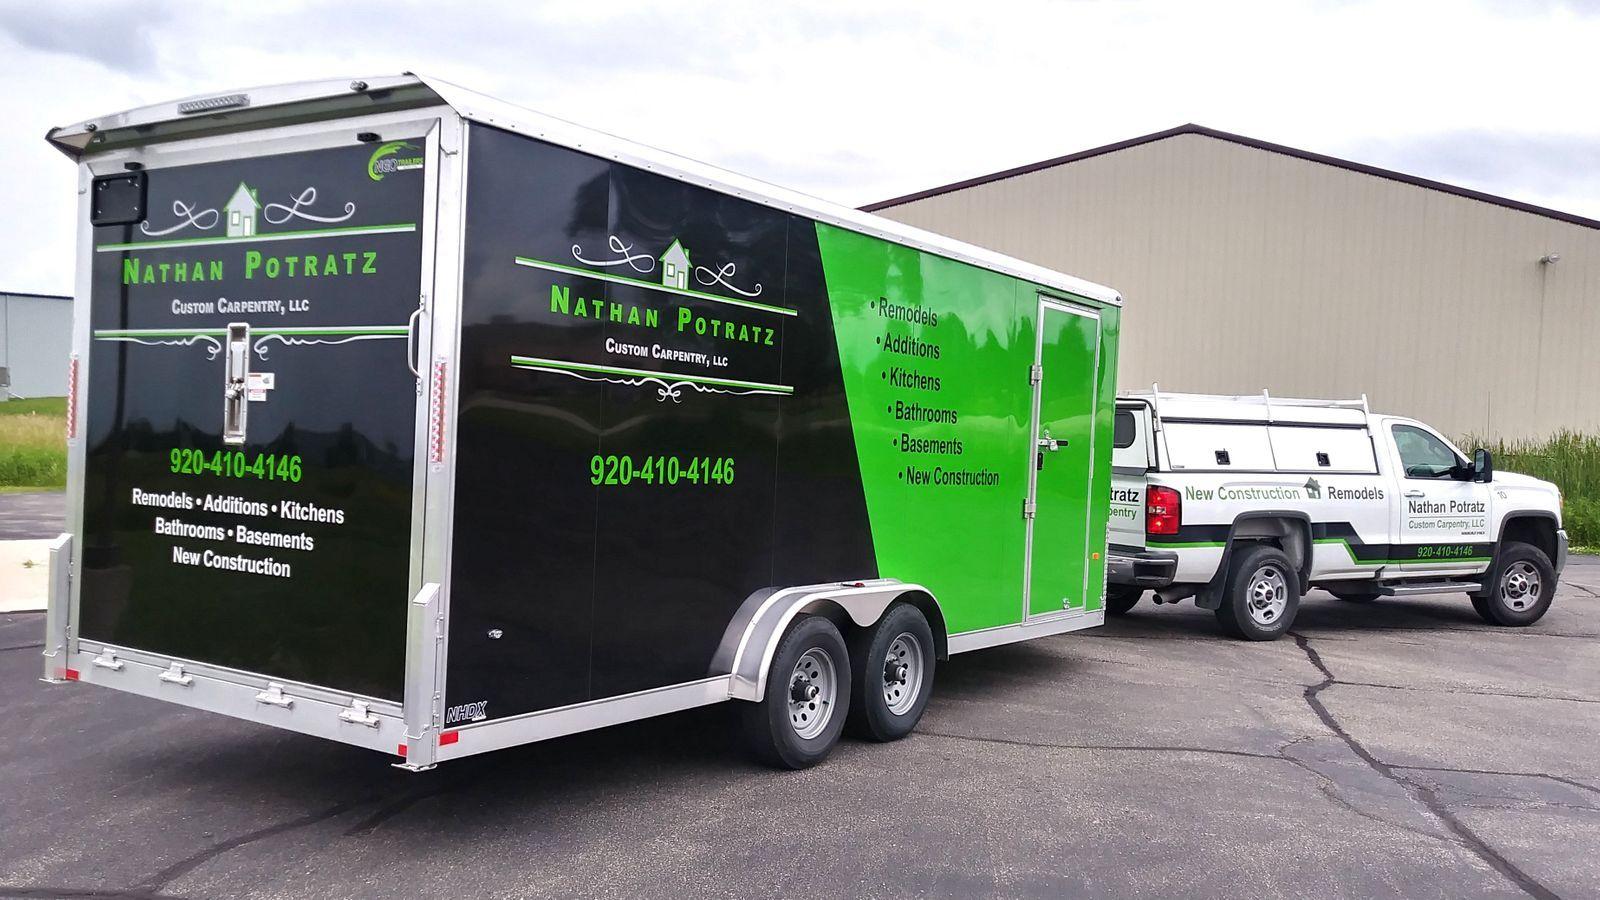 Potratz Truck and Trailer